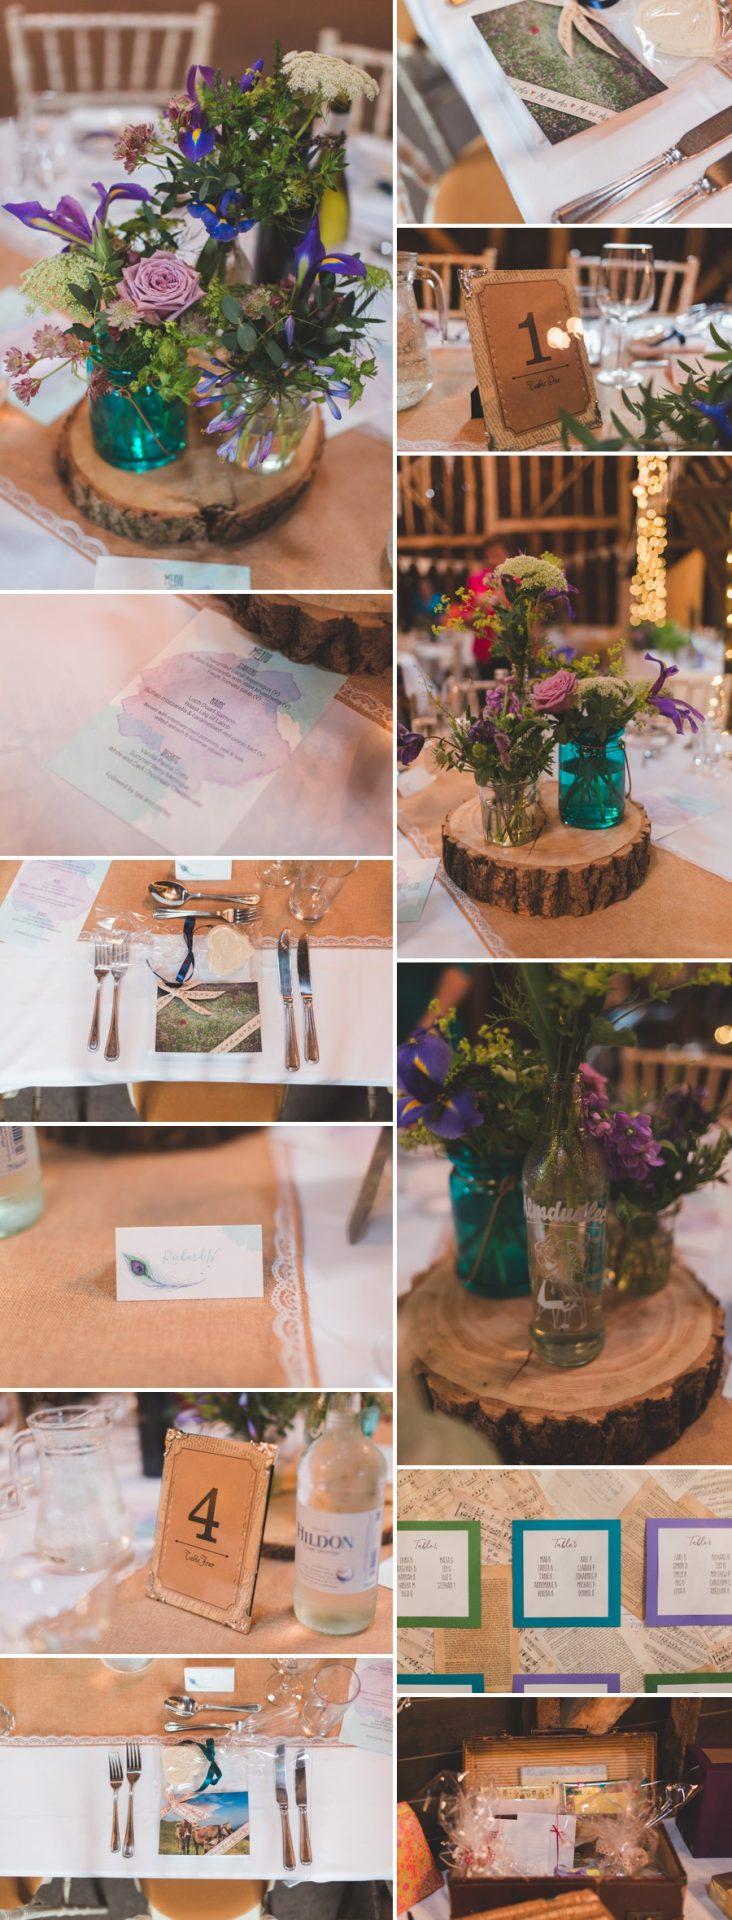 The Manor Barn Harlton wedding photography